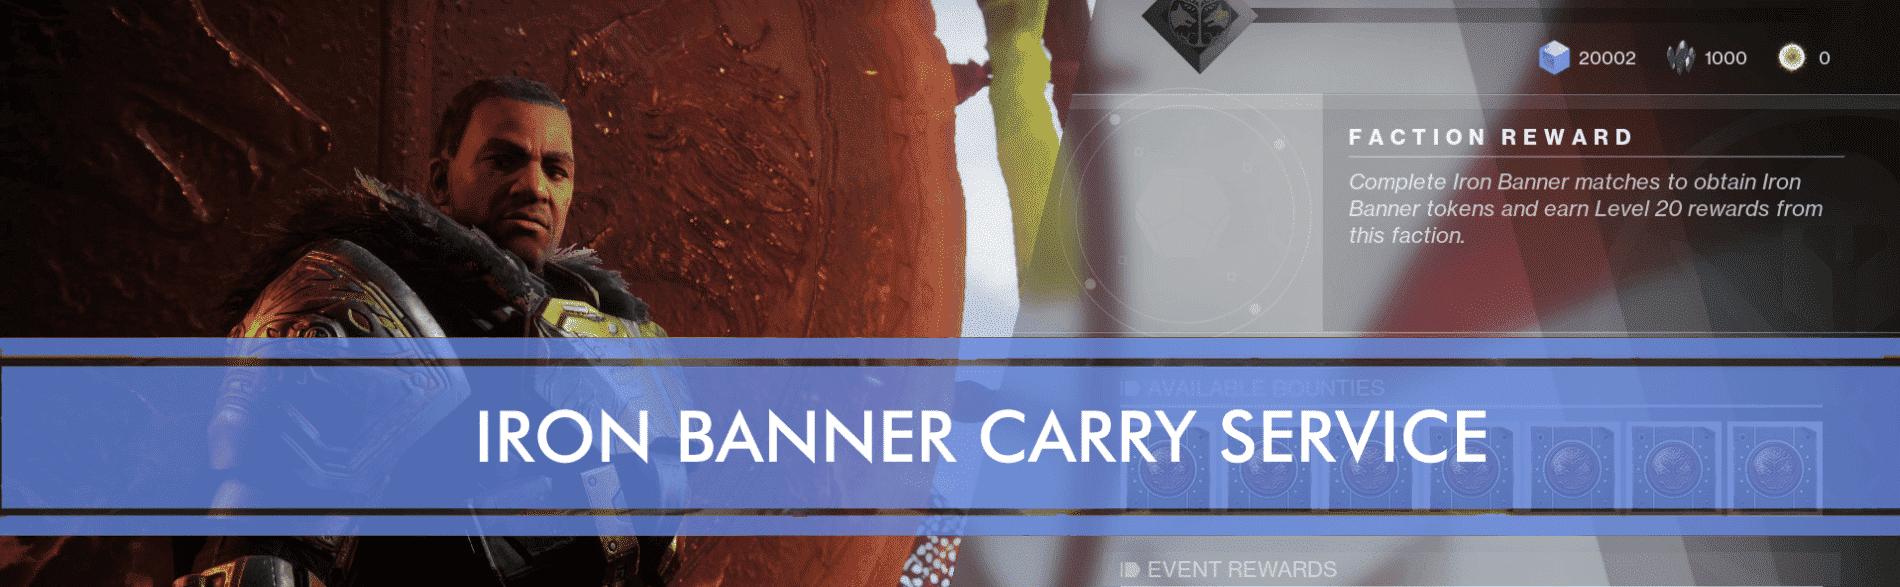 iron banner